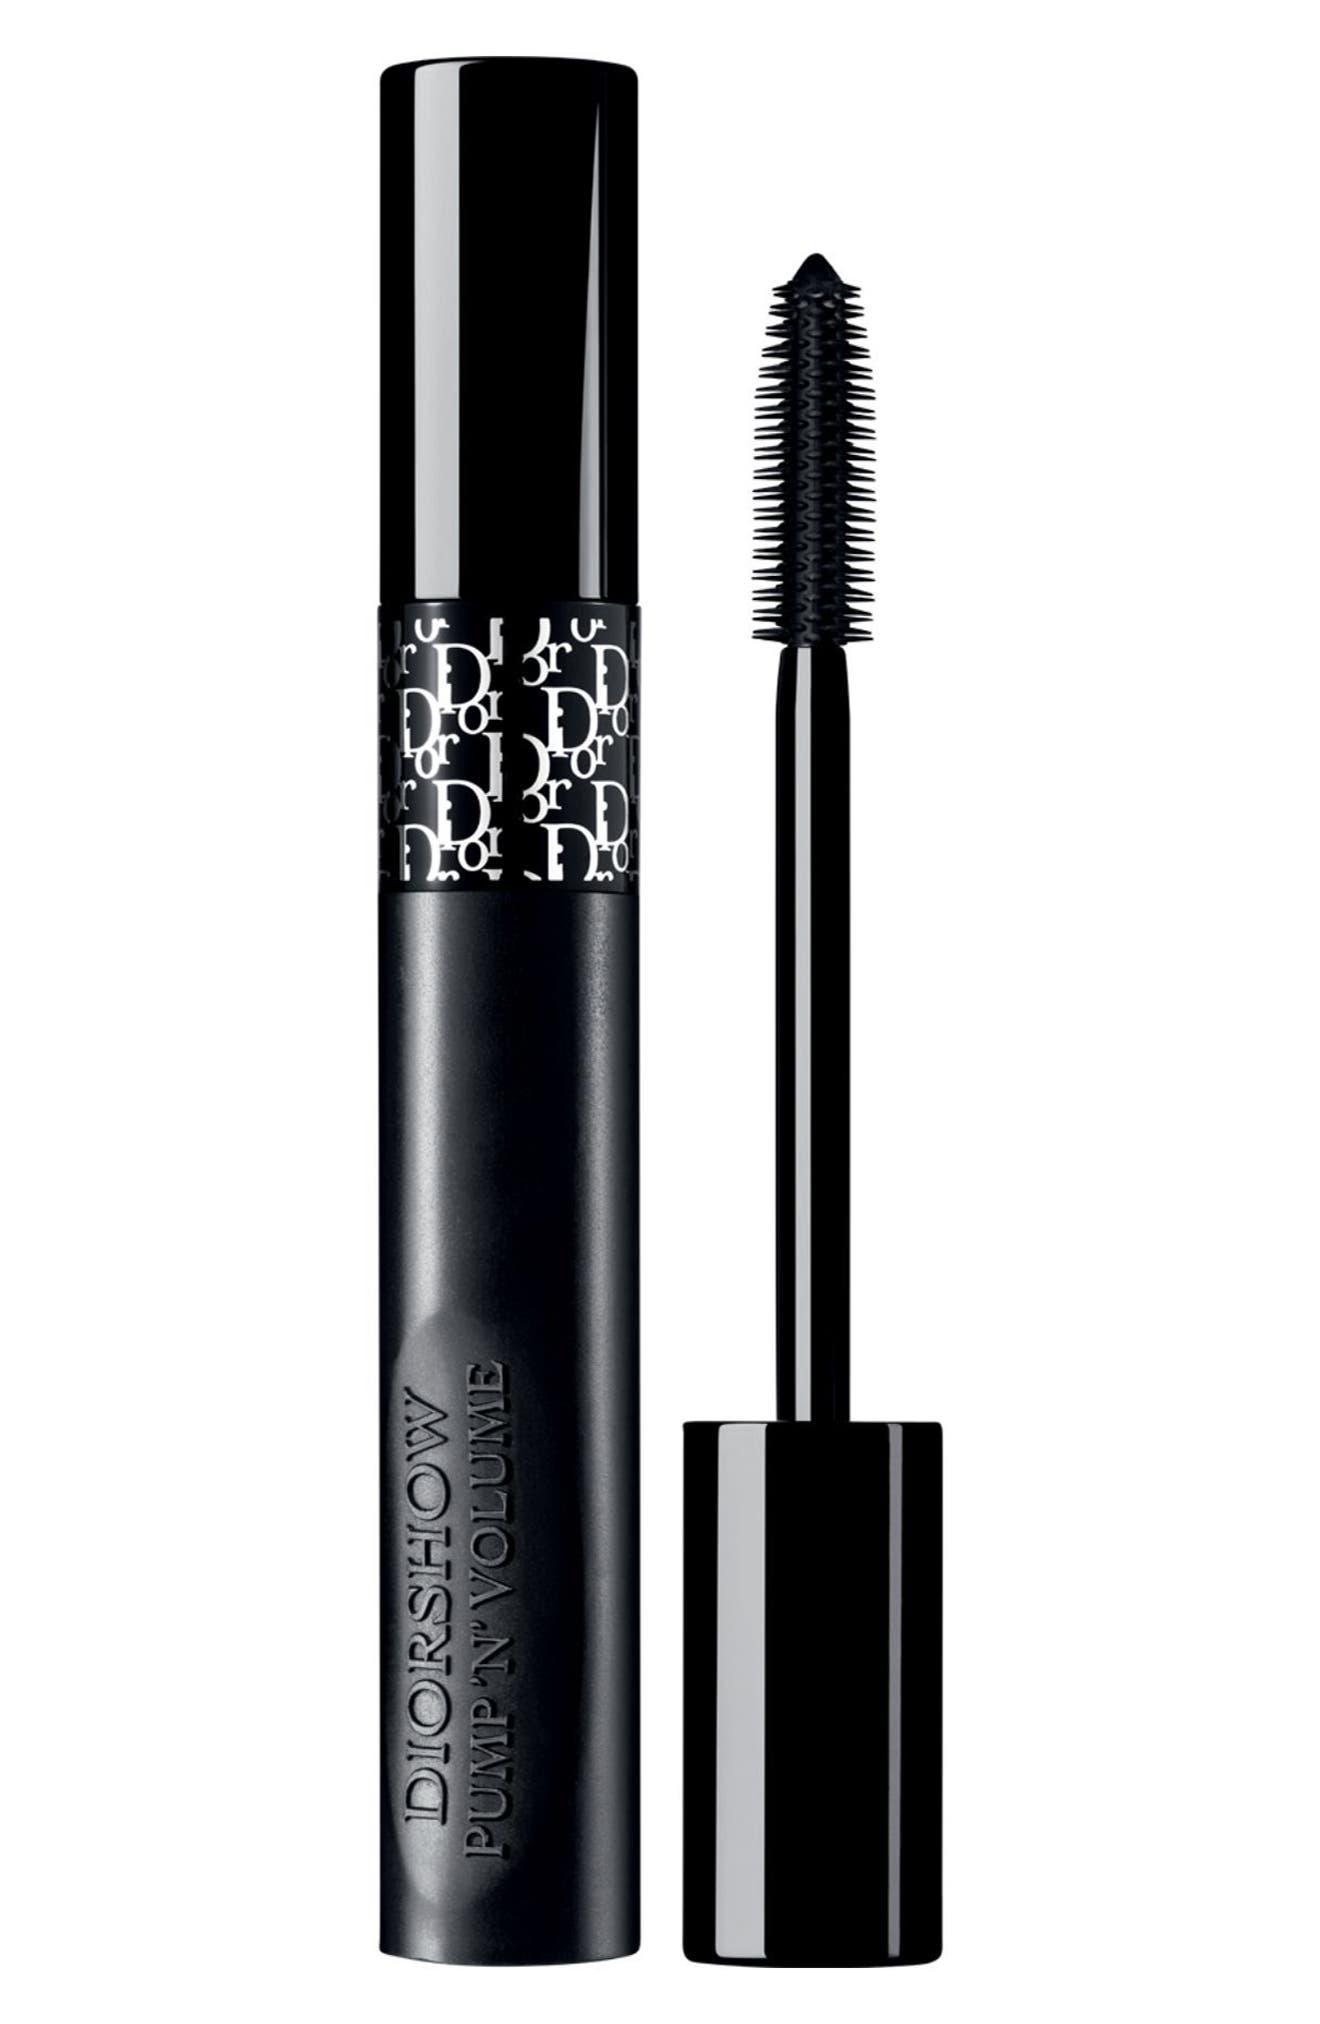 Dior Diorshow Pump'n'Volume Instant Volume Squeezable Mascara